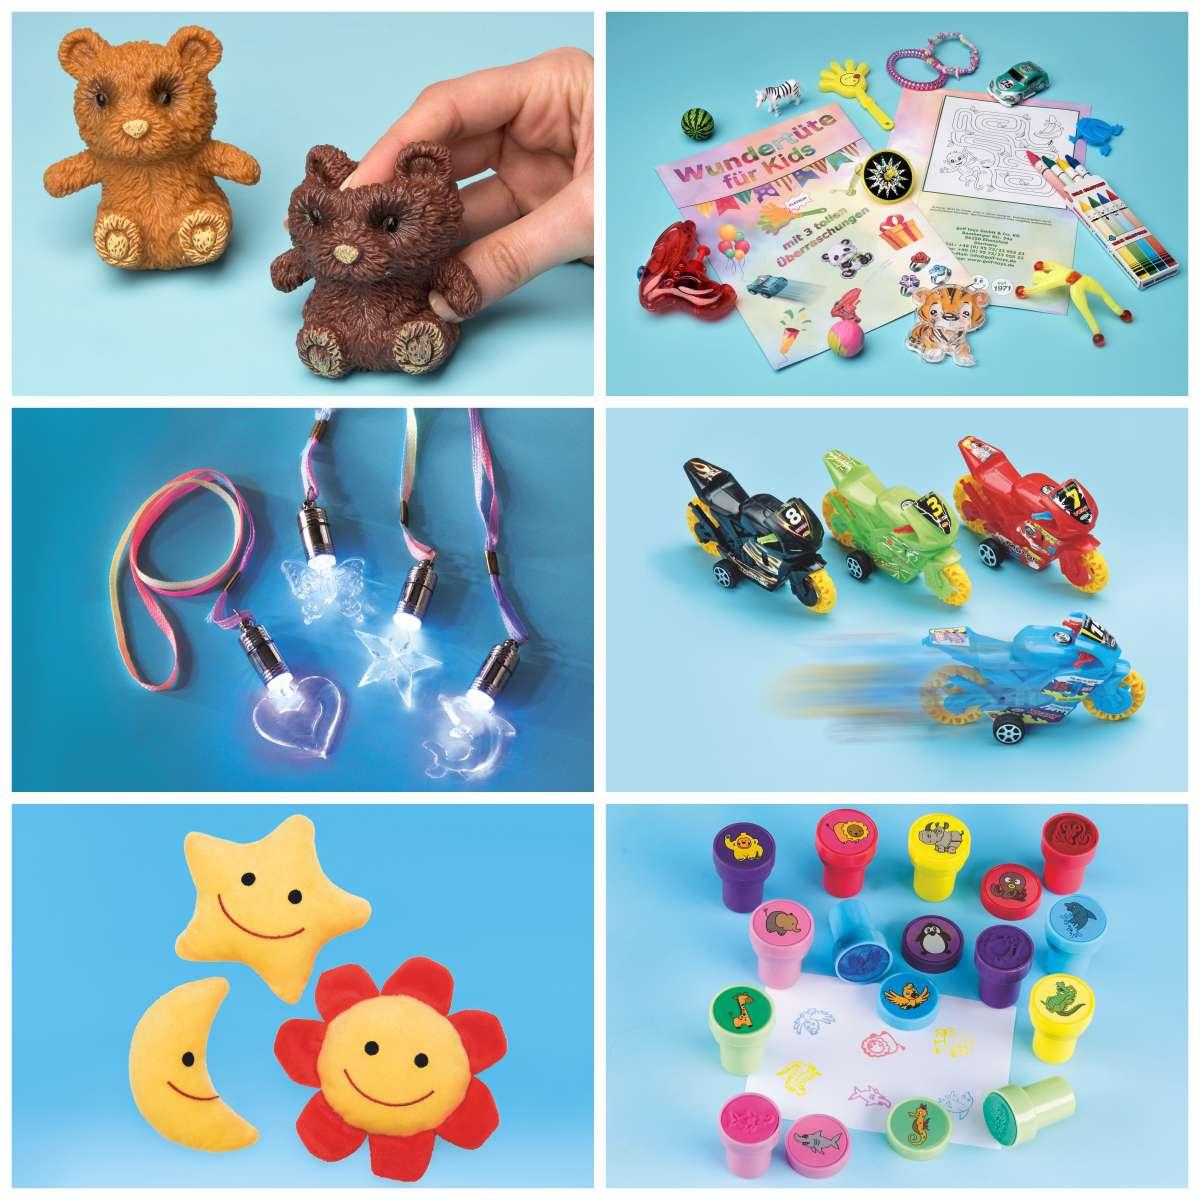 Spielzeugpaket